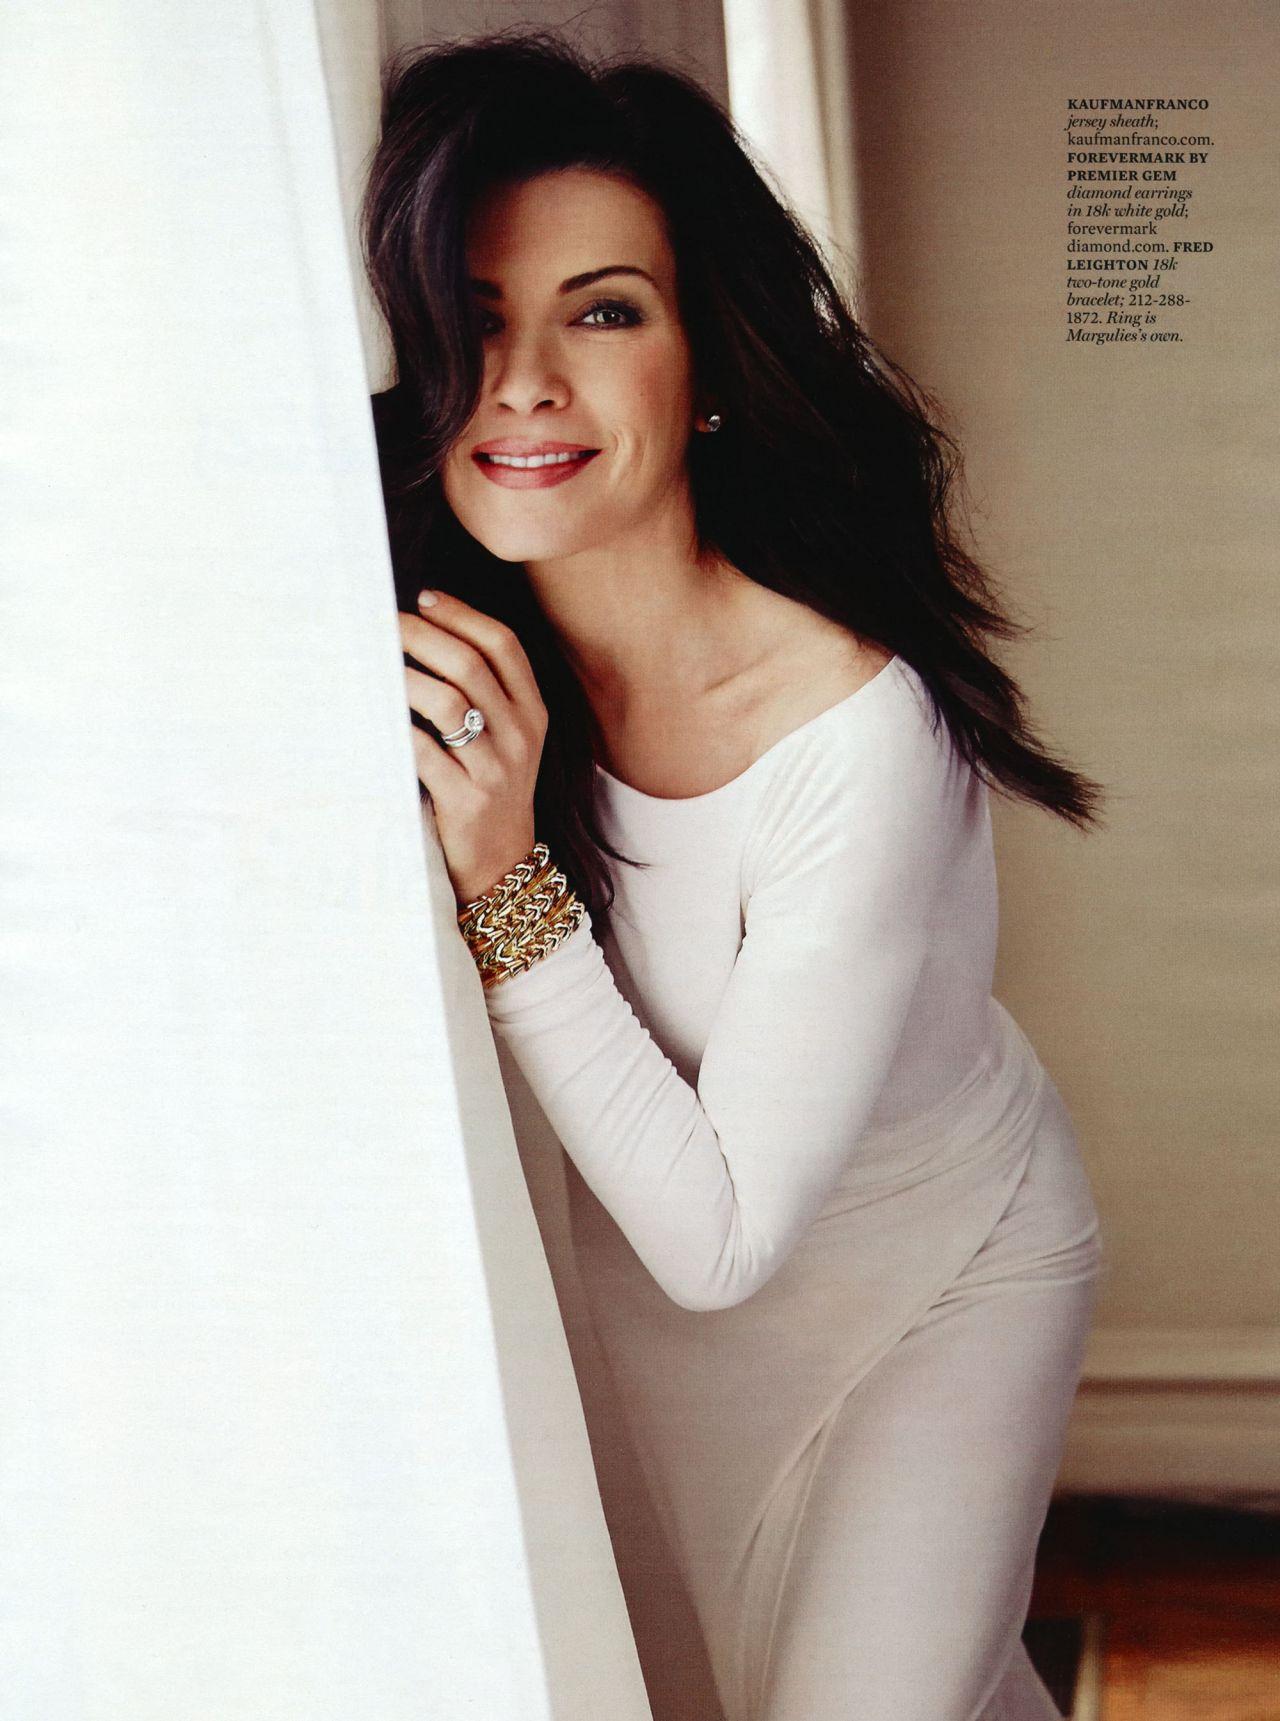 More Magazine (Canada) April 2014 Issue